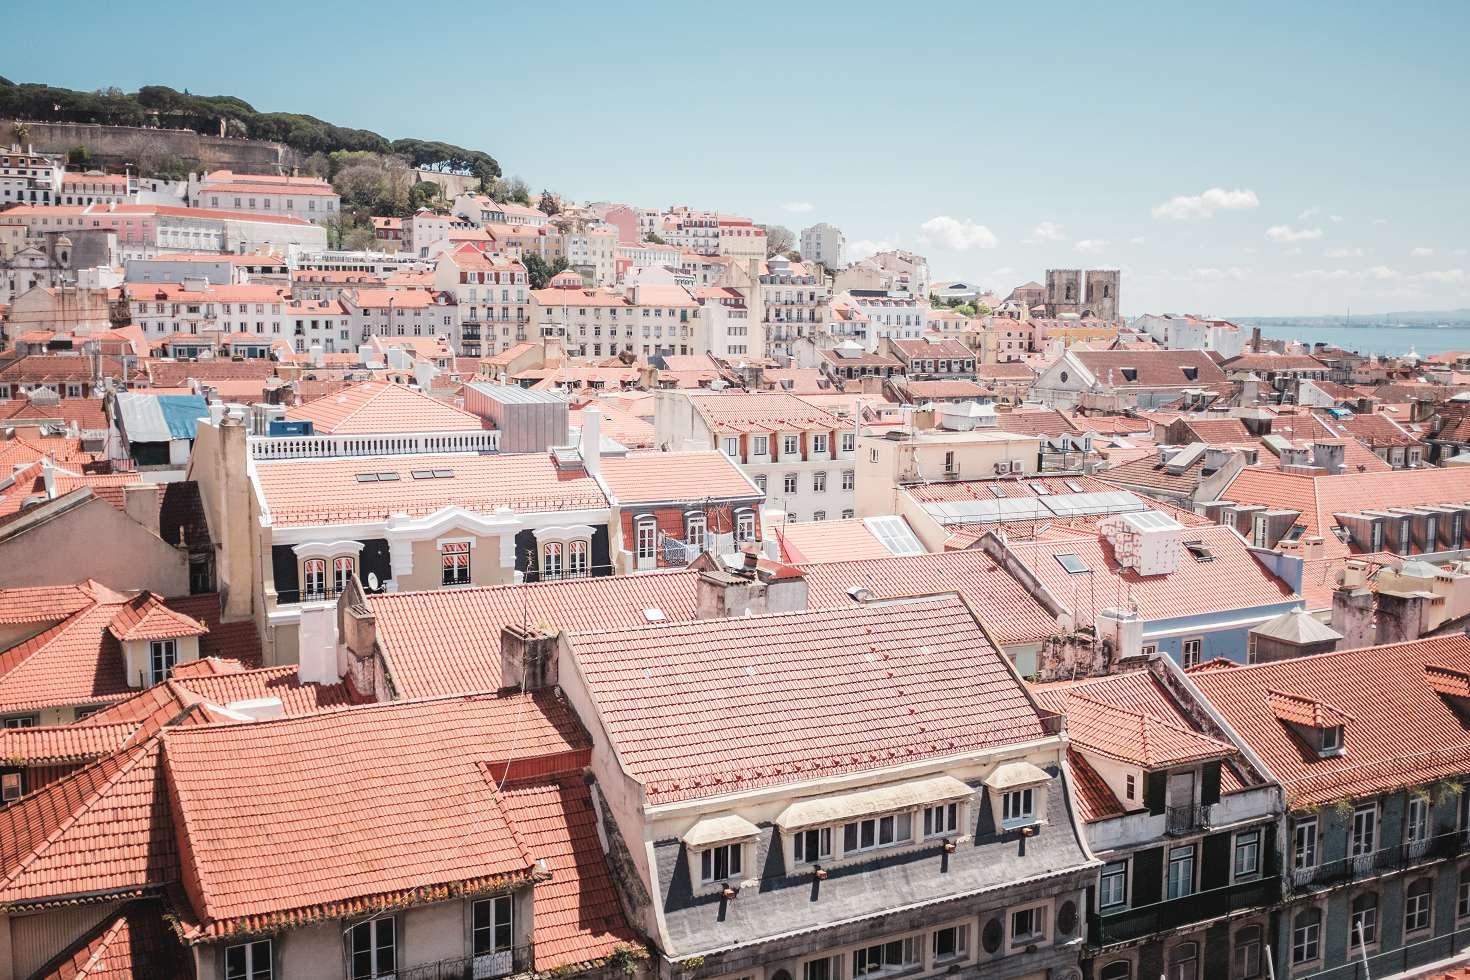 Valencia-Lissabon-Vigo-Stonehenge (35)